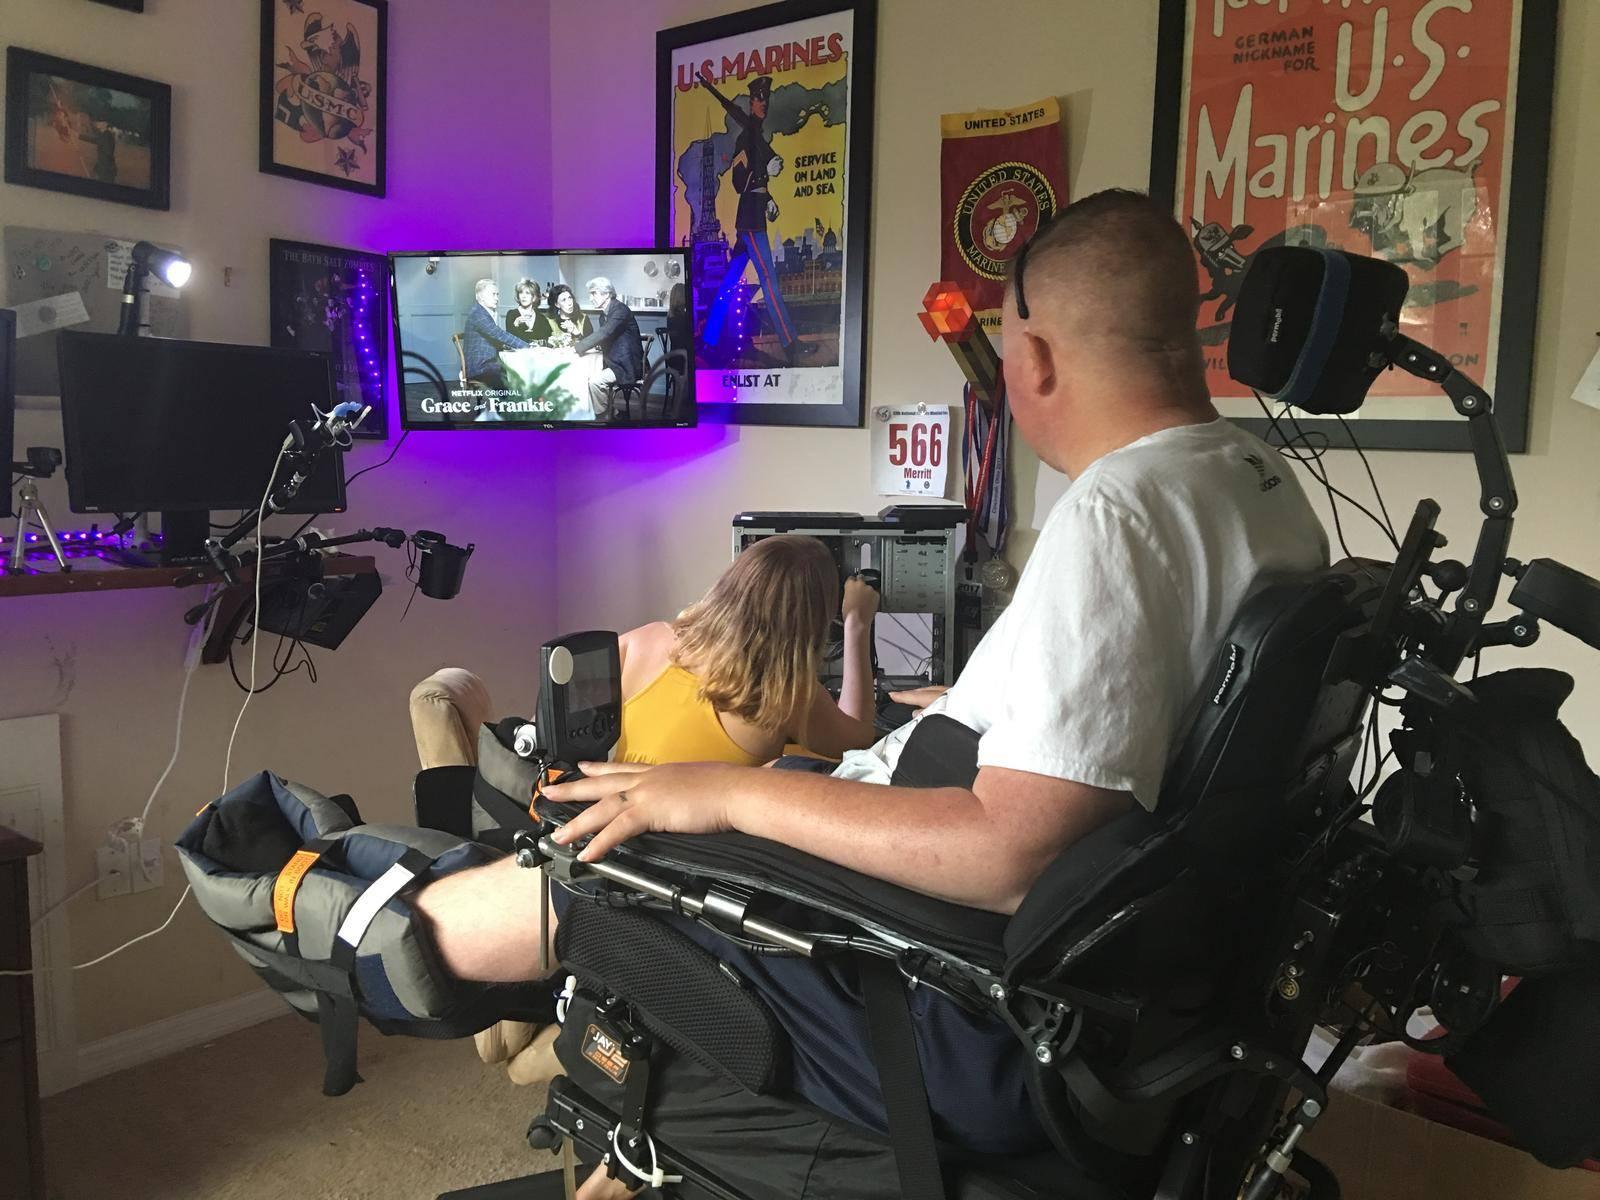 In Aprilish 2017 I began communicating with organizations in hopes to upgrade my ... & Quadriplegic PC Computer Setup Gaming Workstation - Quadcapable